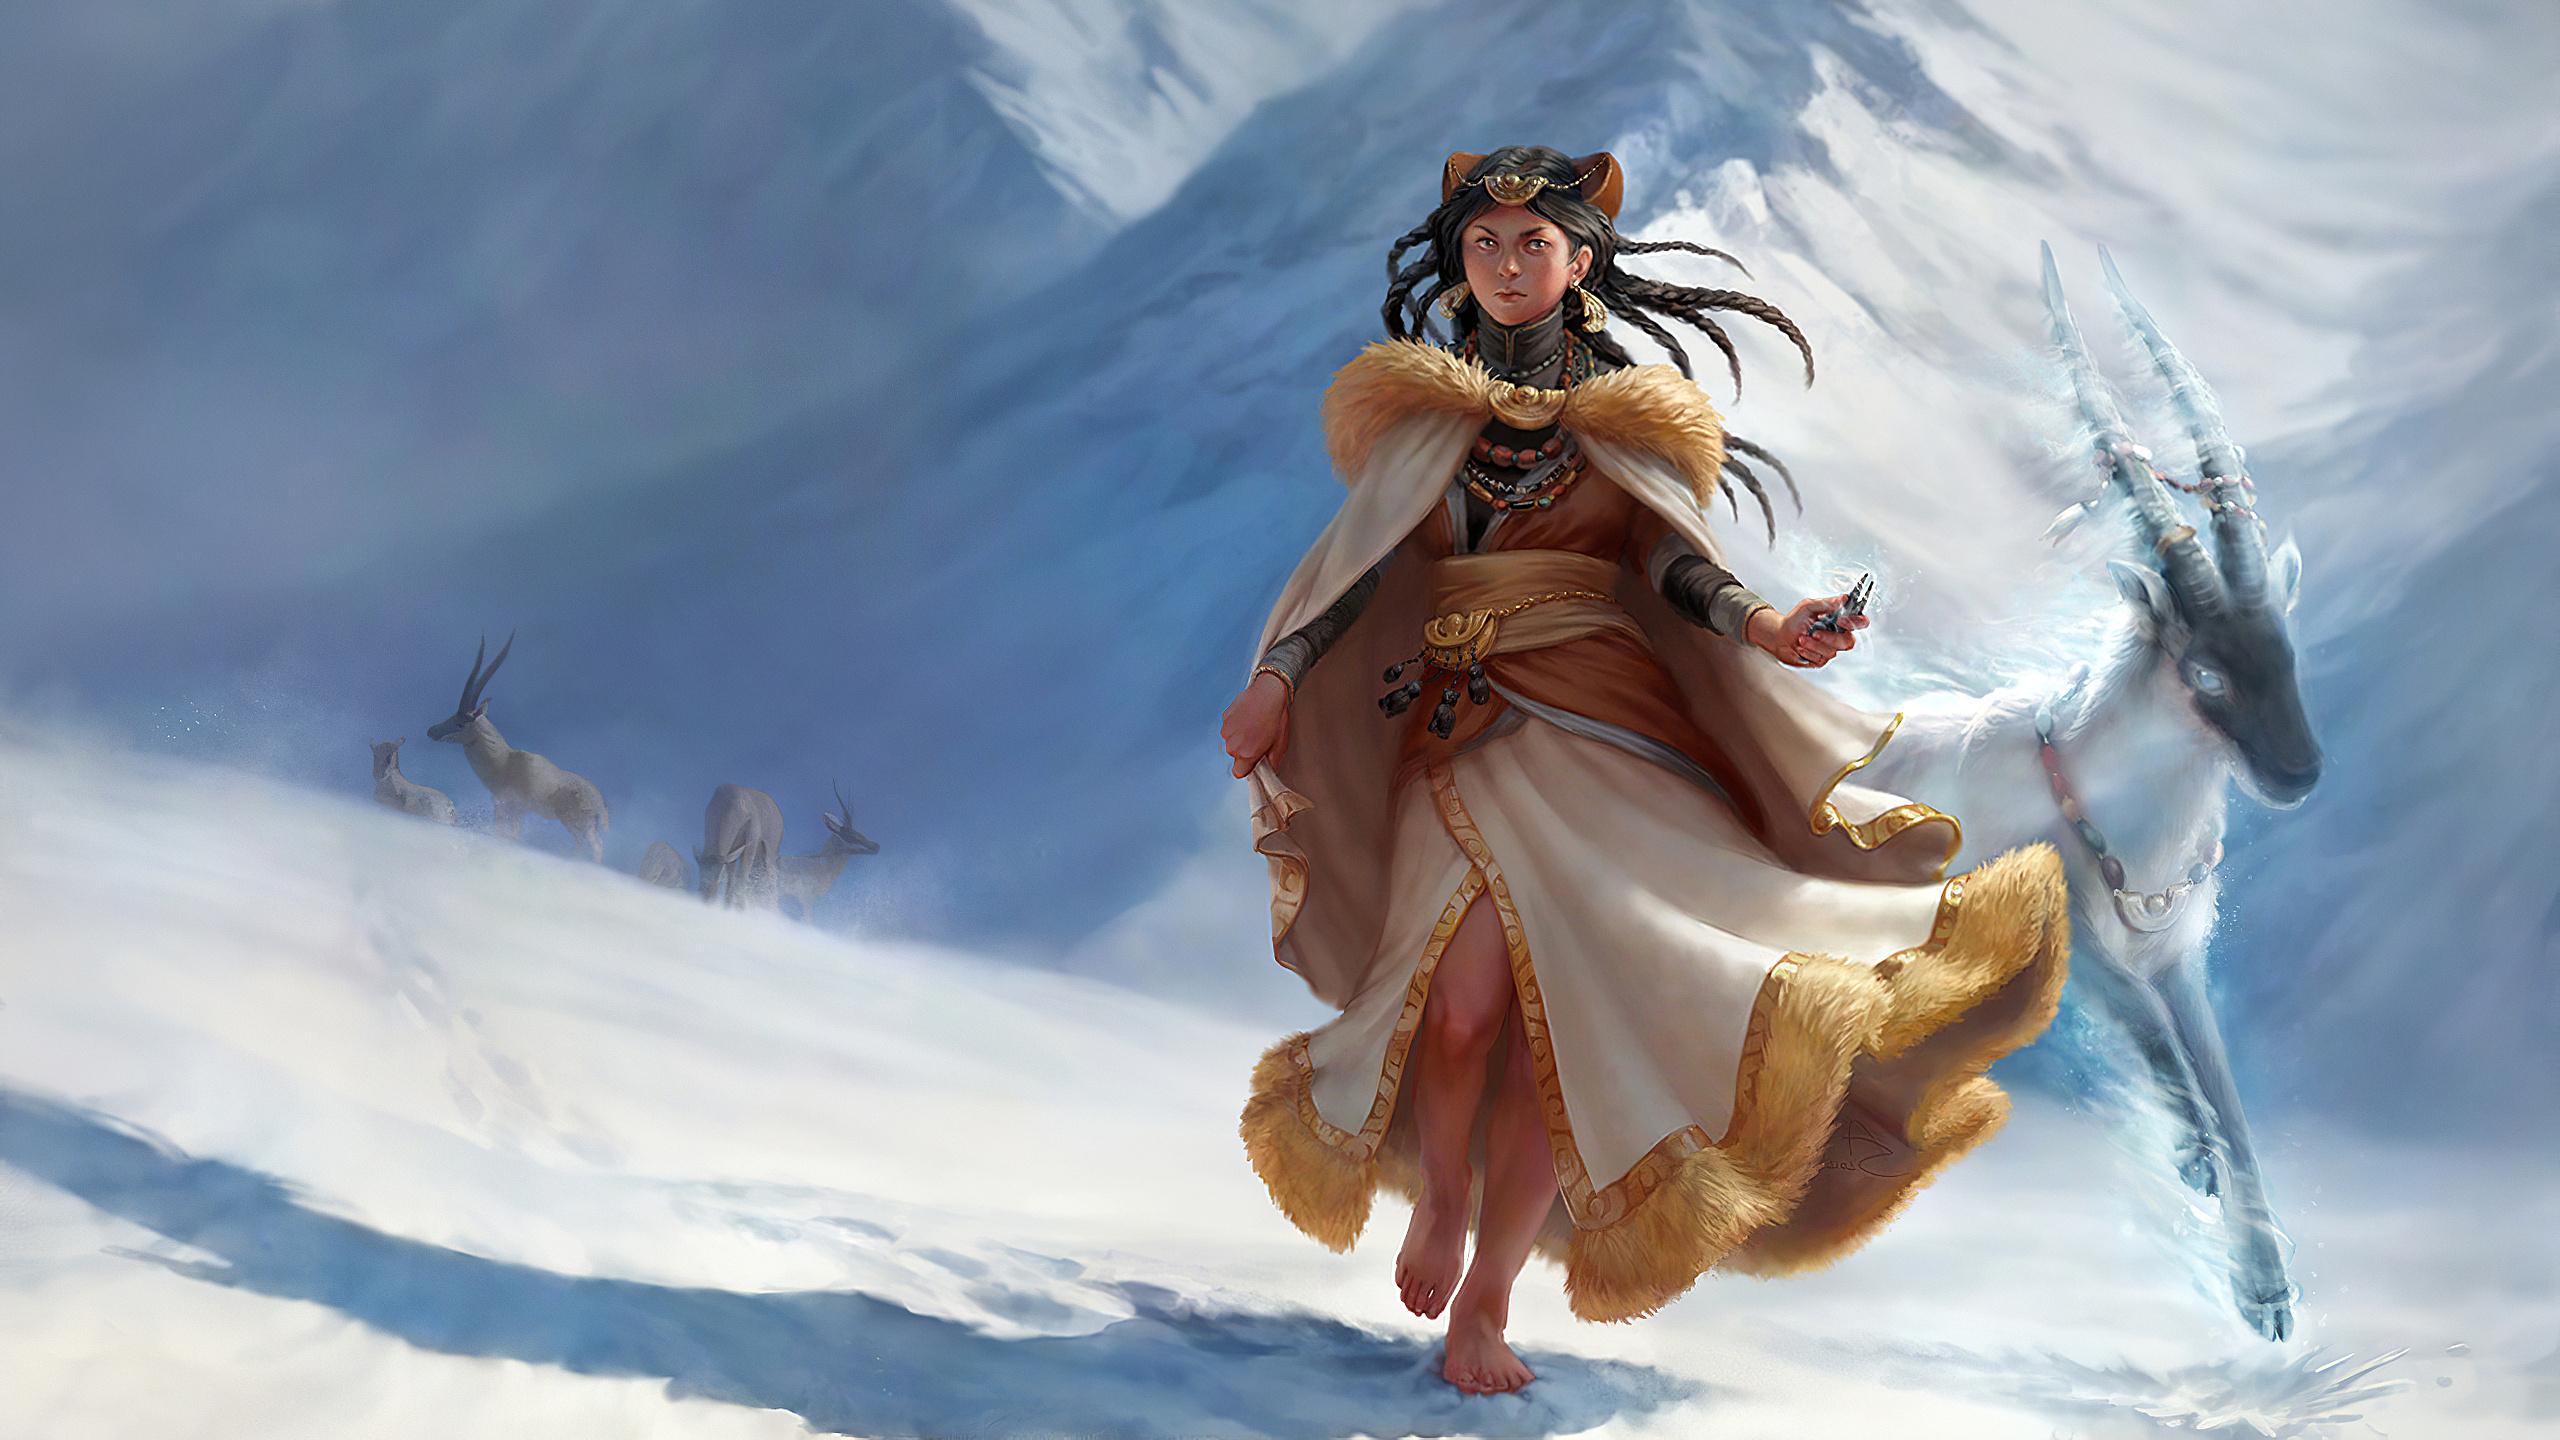 Картинки якутяночка рисованные